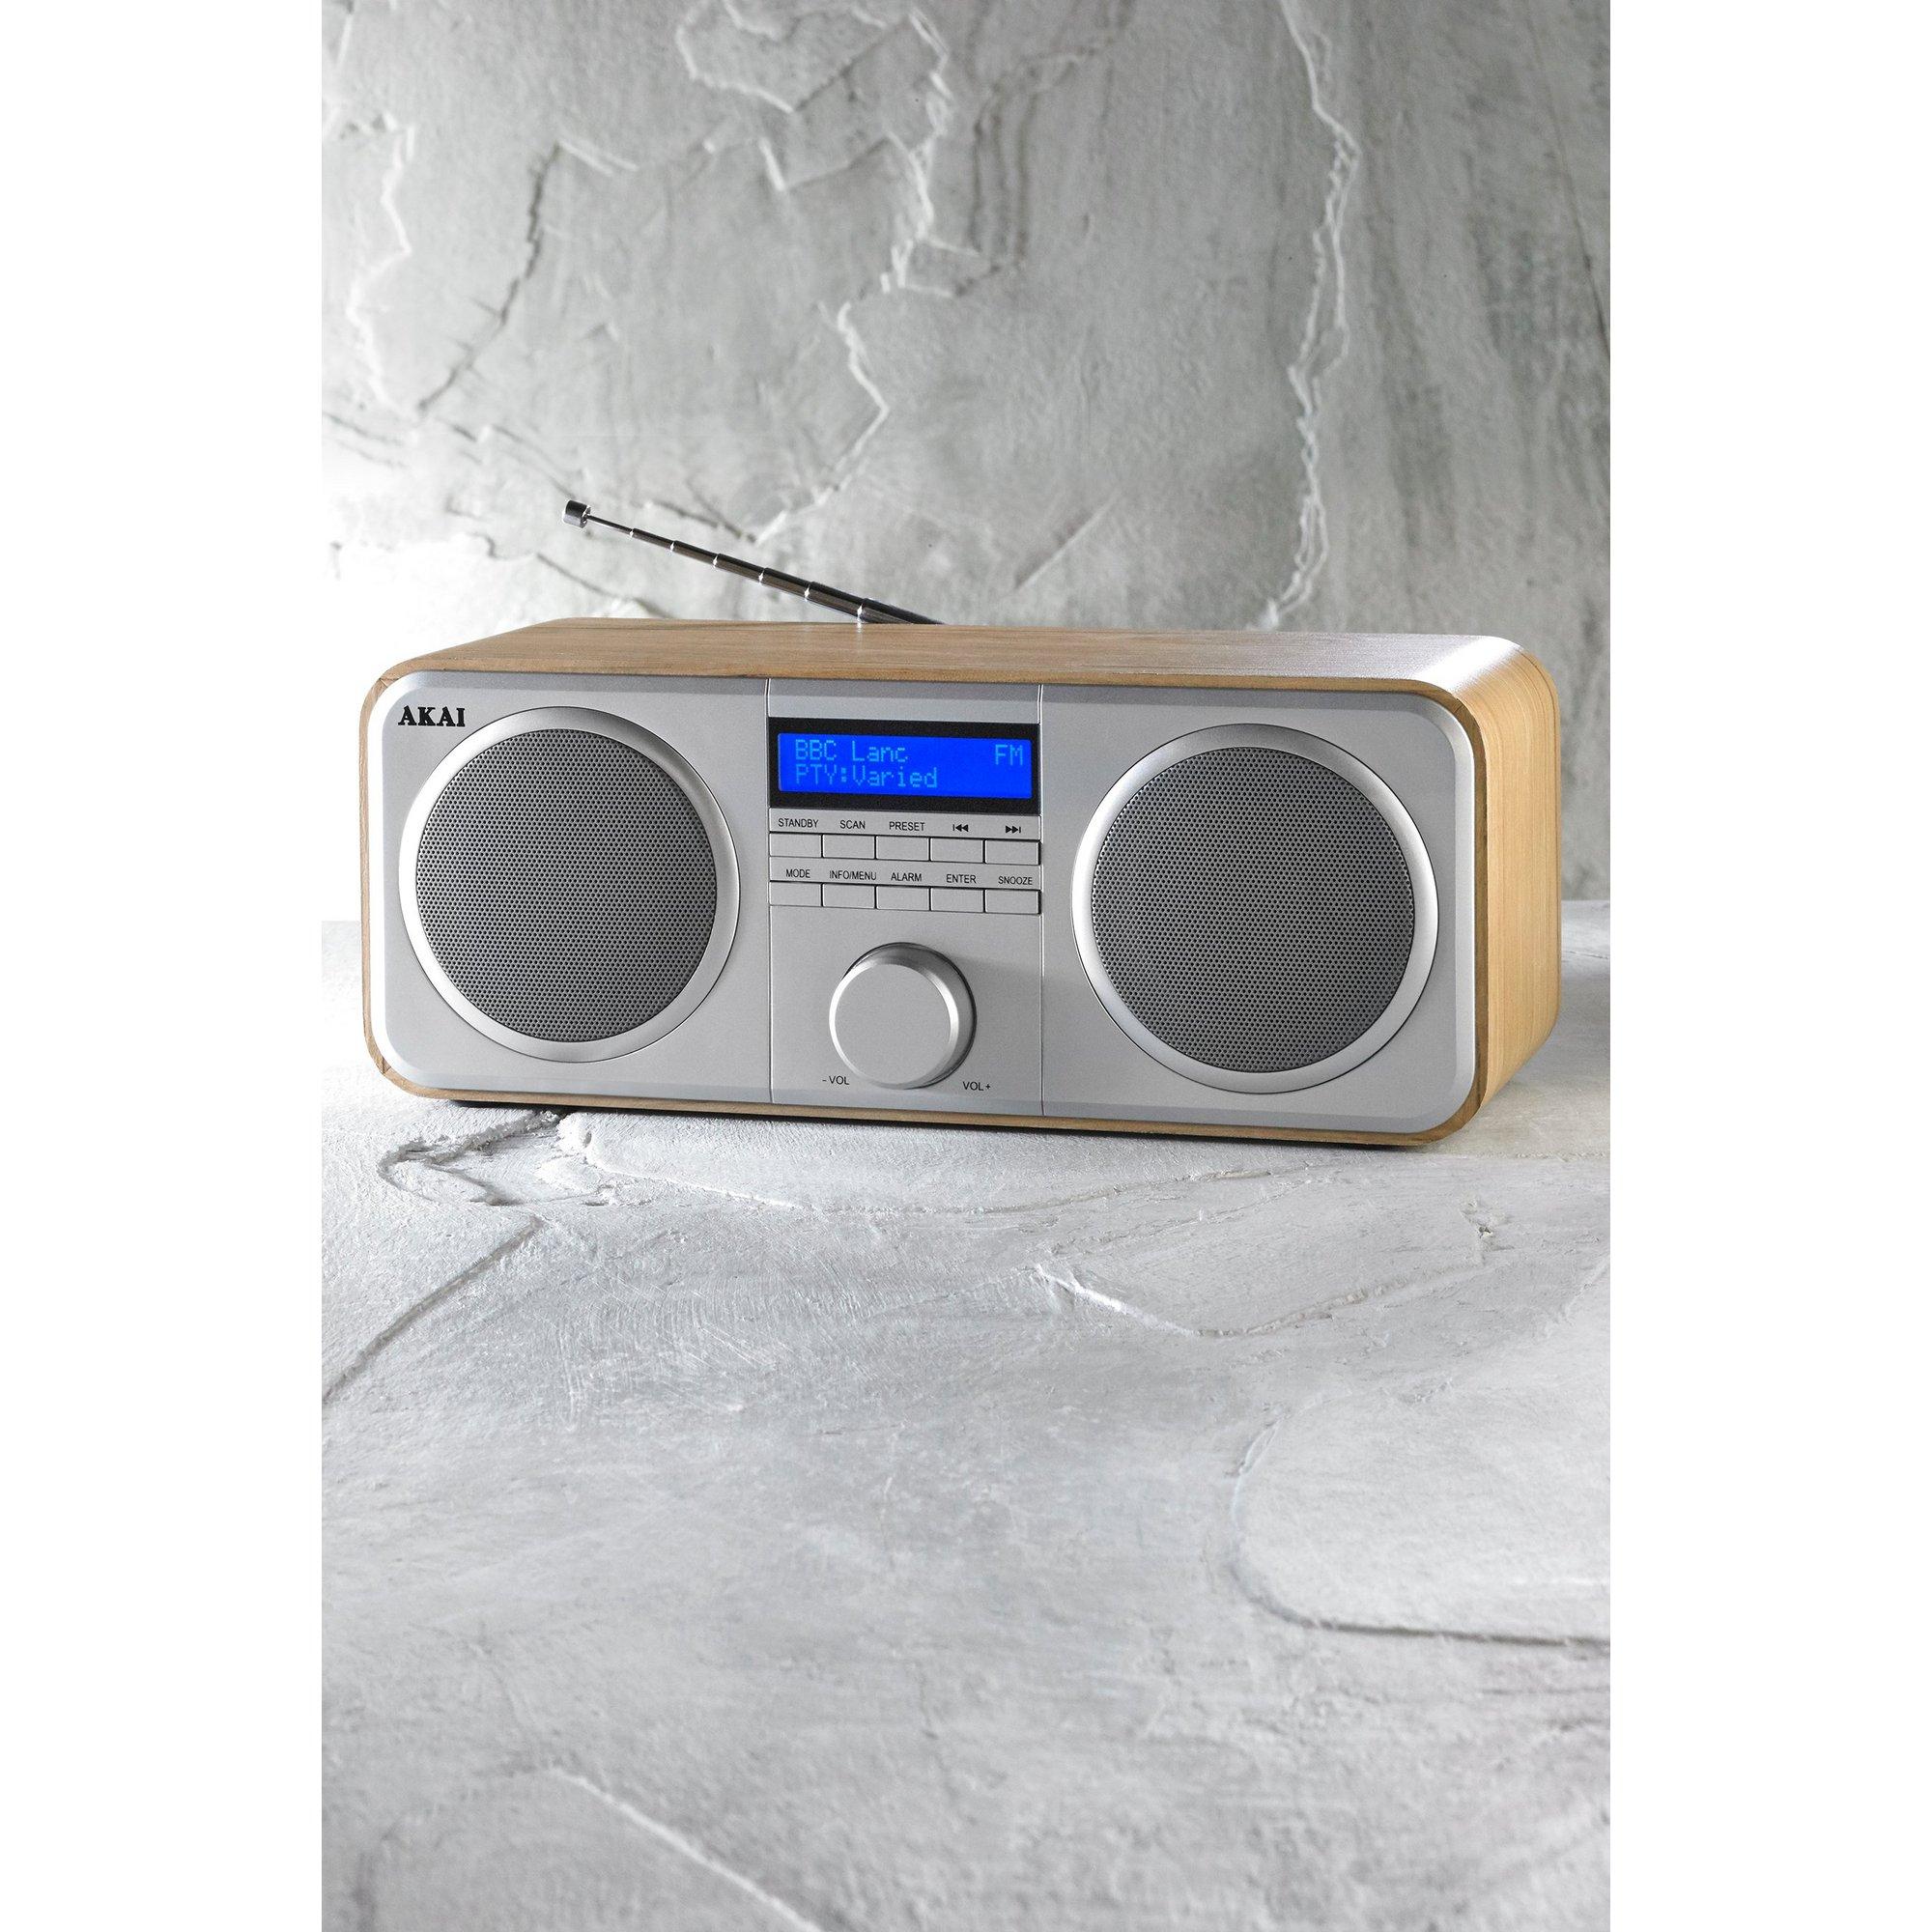 Image of Akai DAB Stereo Radio